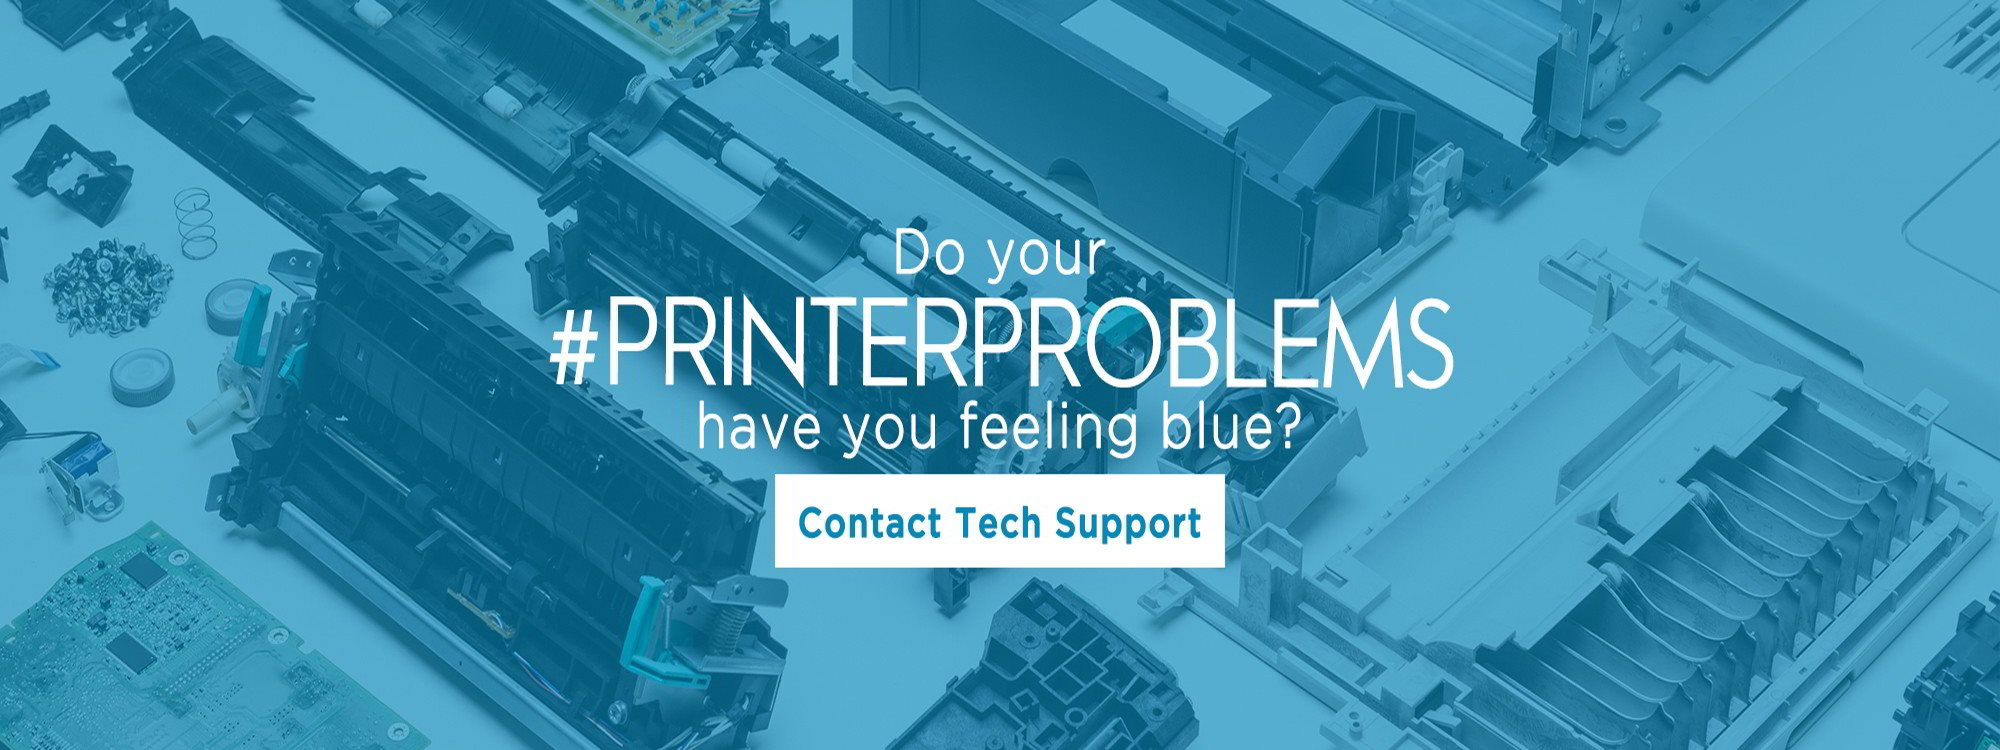 printer-problem-slider